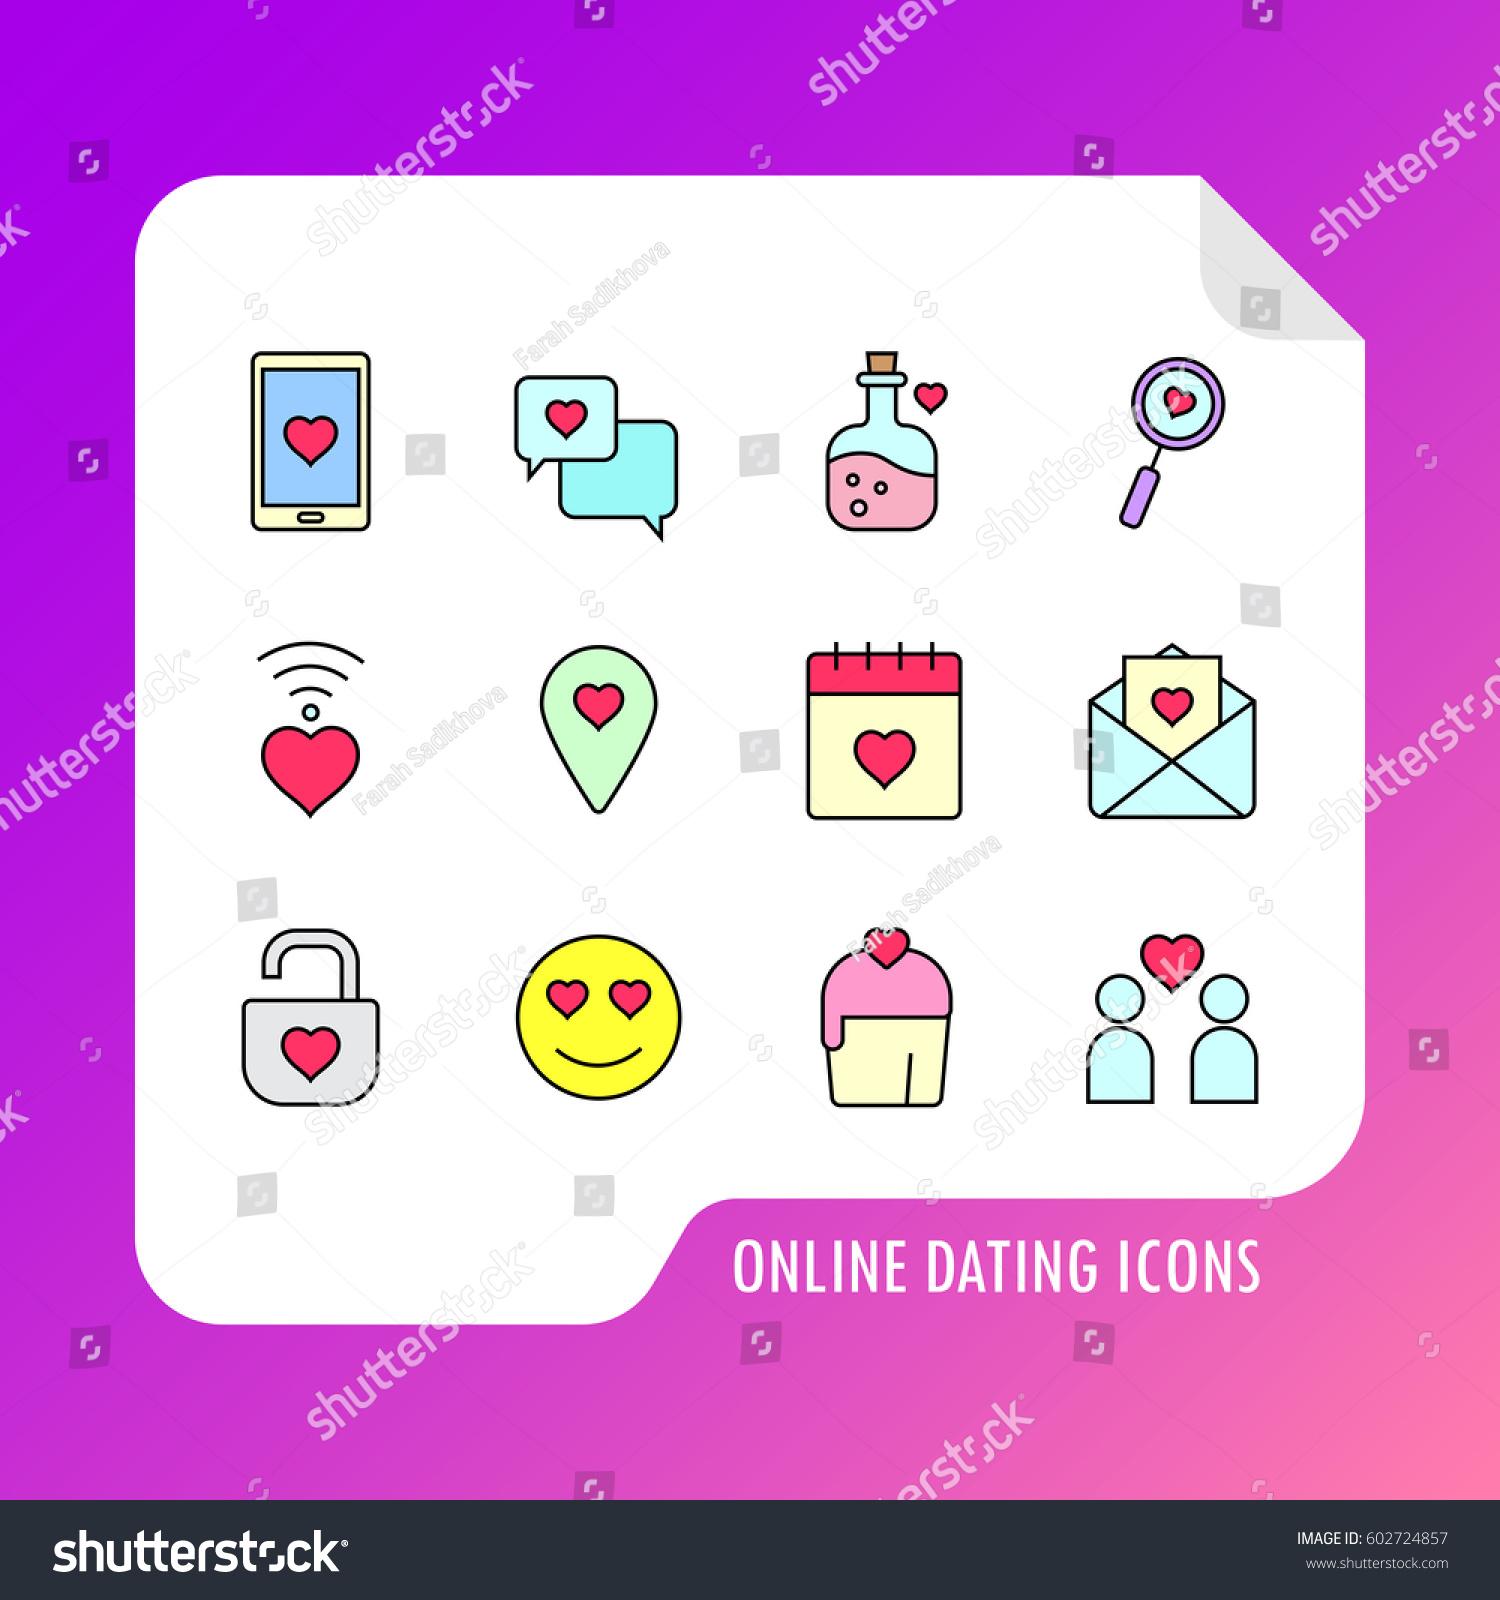 immagini vettoriali online dating